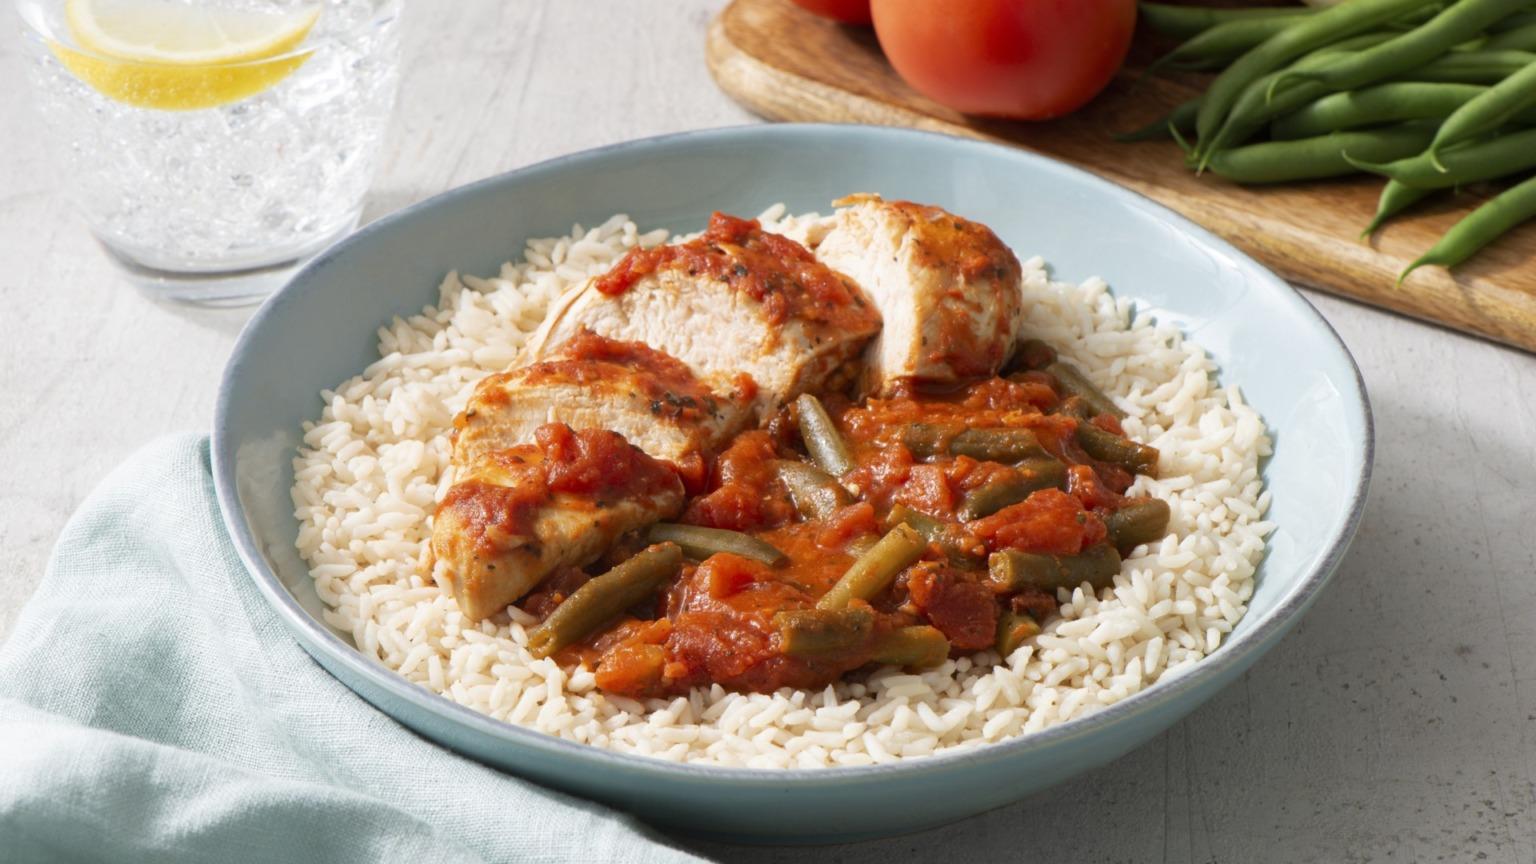 15 Minute Mediterranean-Style Chicken and Rice